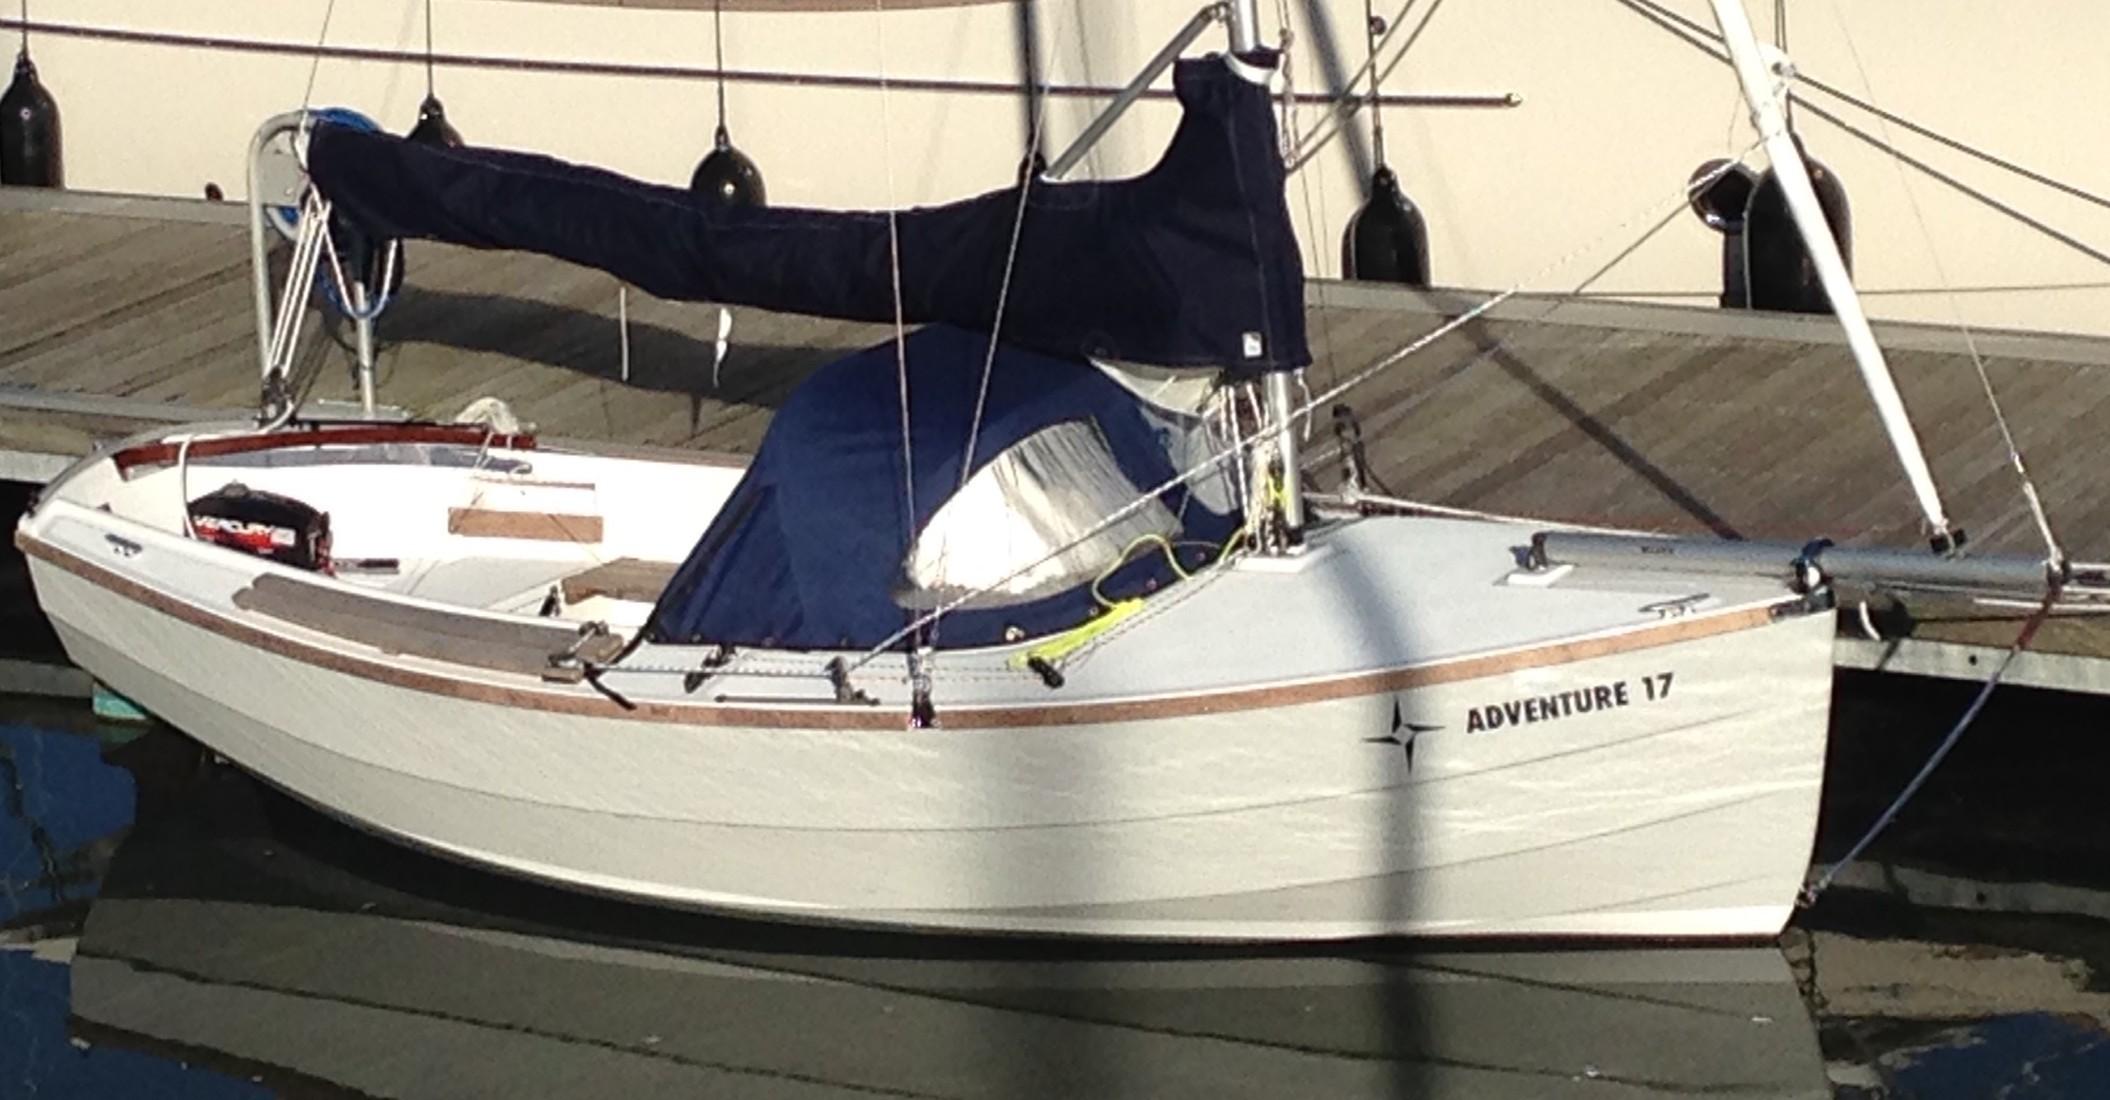 adventure-17-mooring-e1470319223886